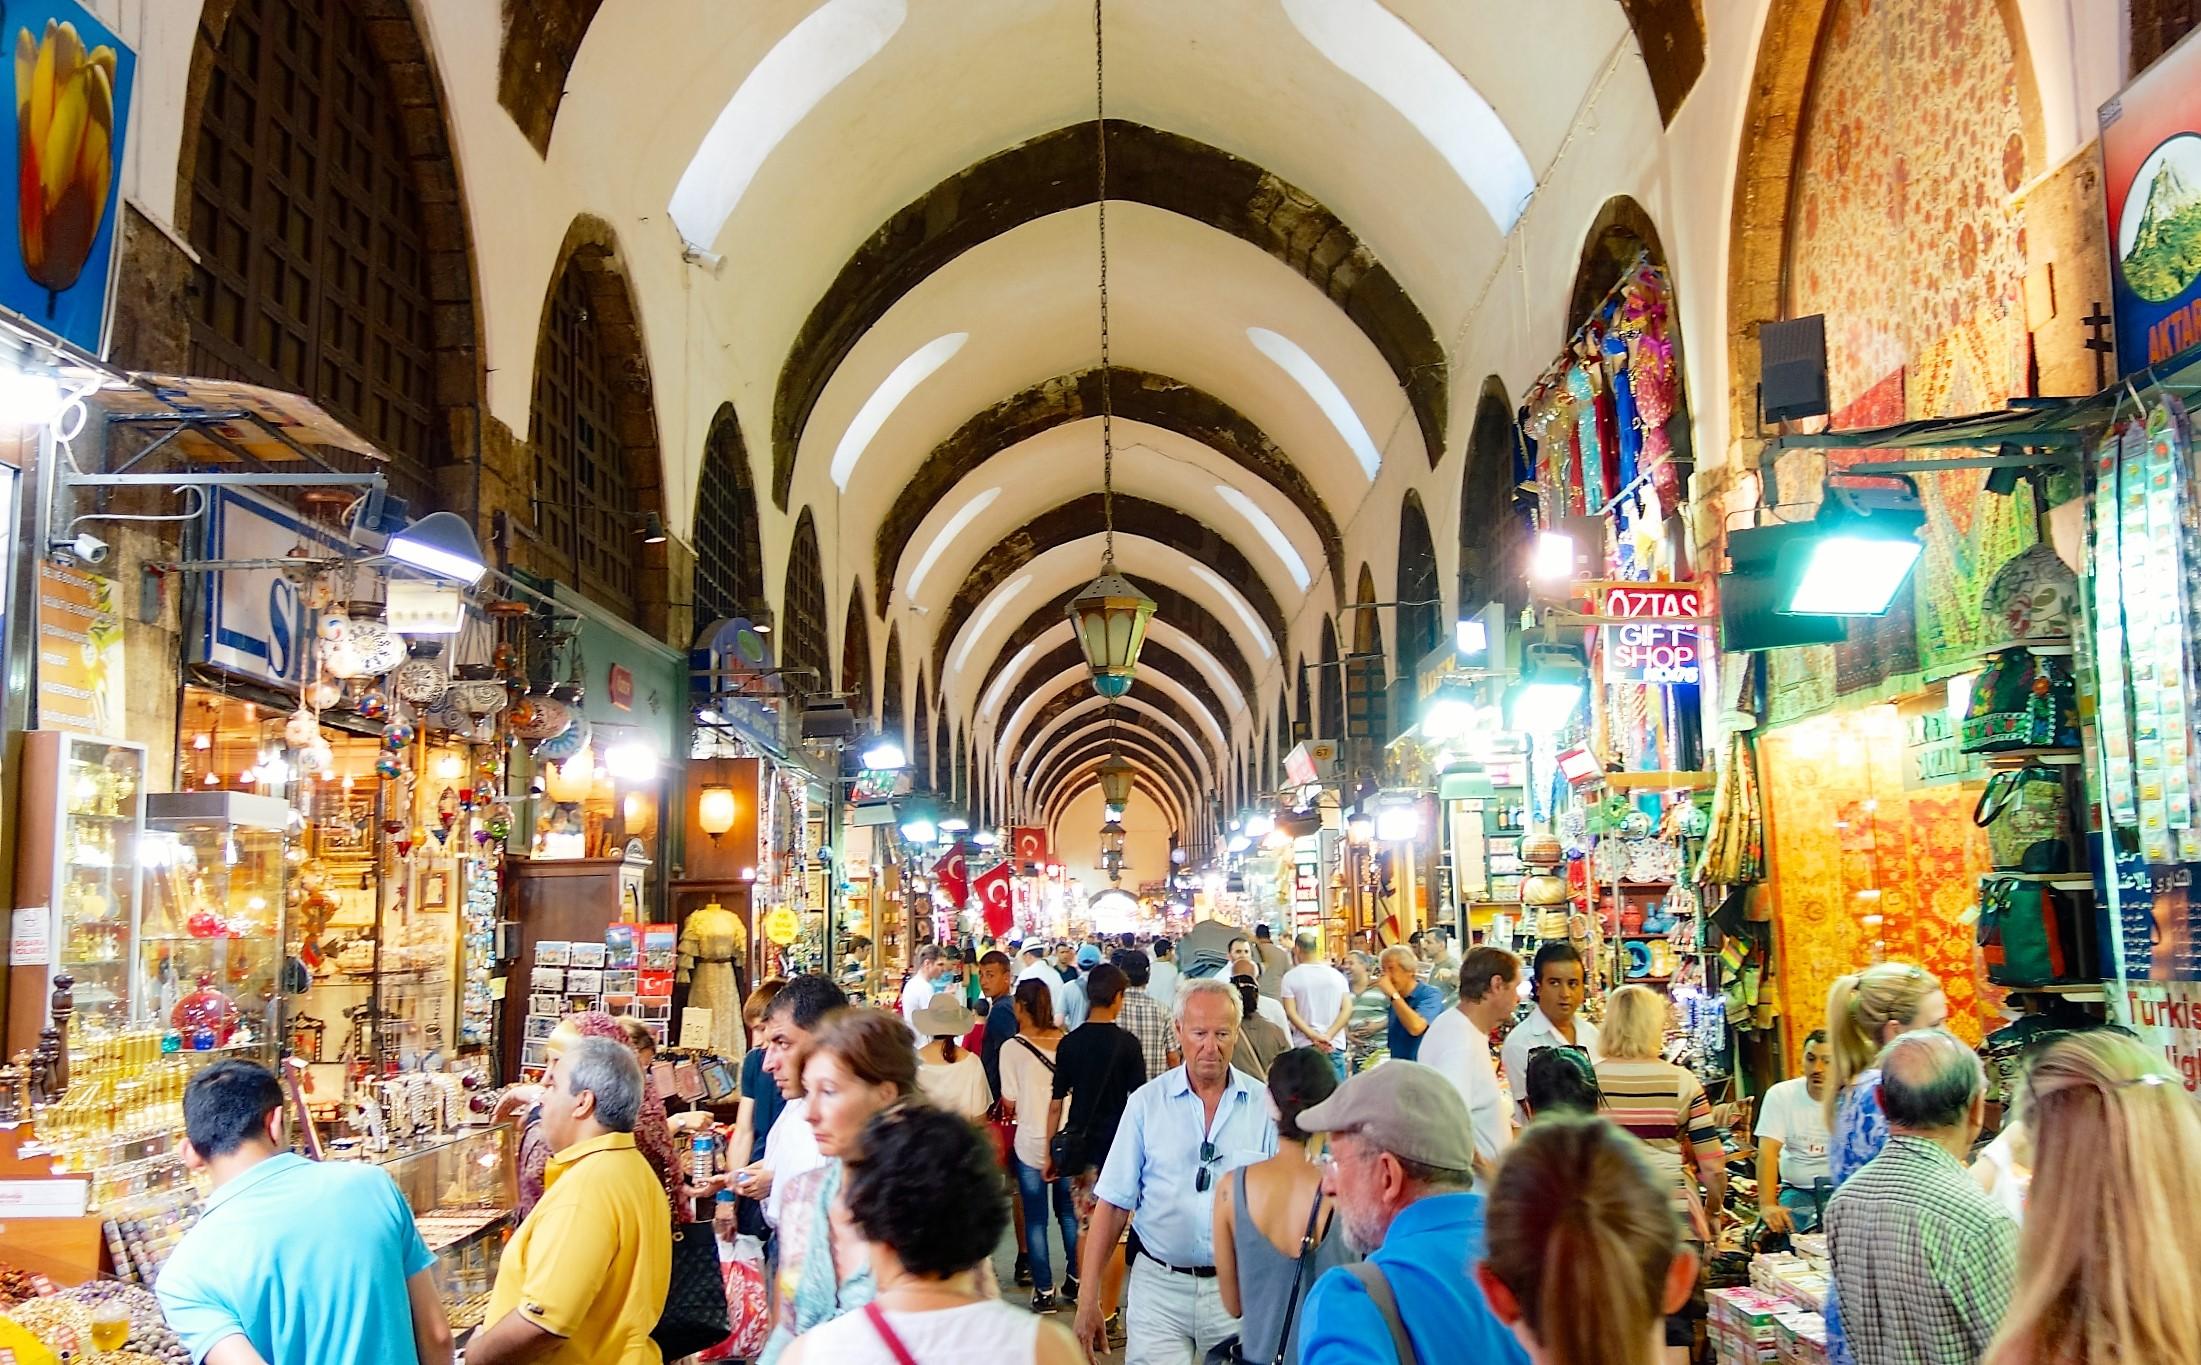 Bazaar in Istanbul. Photo by Blt Boy.